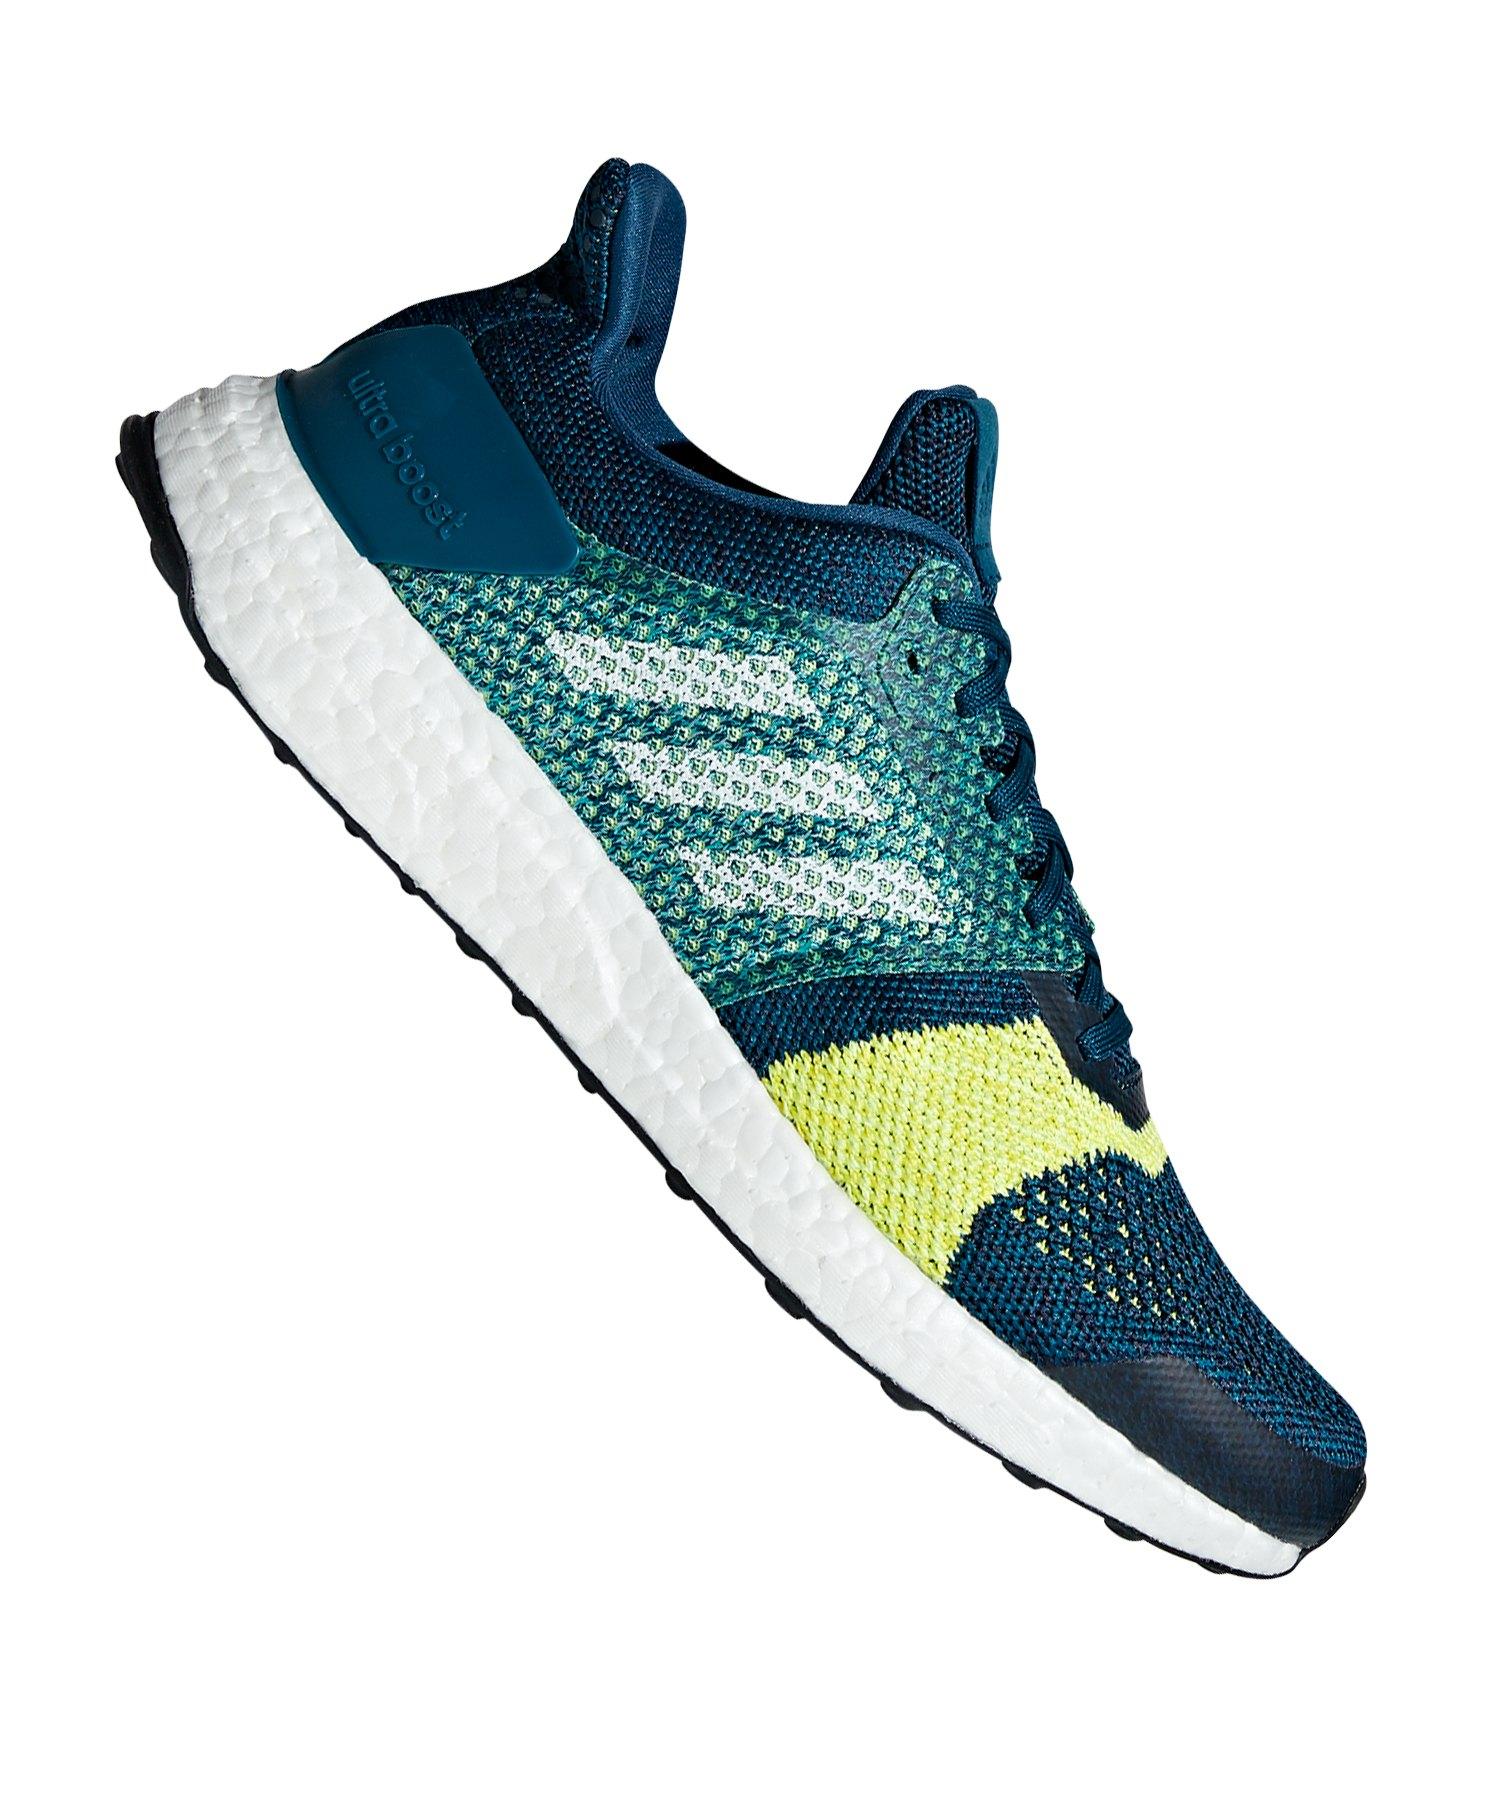 Ultra Joggen Gelb Grün Running Boost Adidas Laufen St 6qvdXA